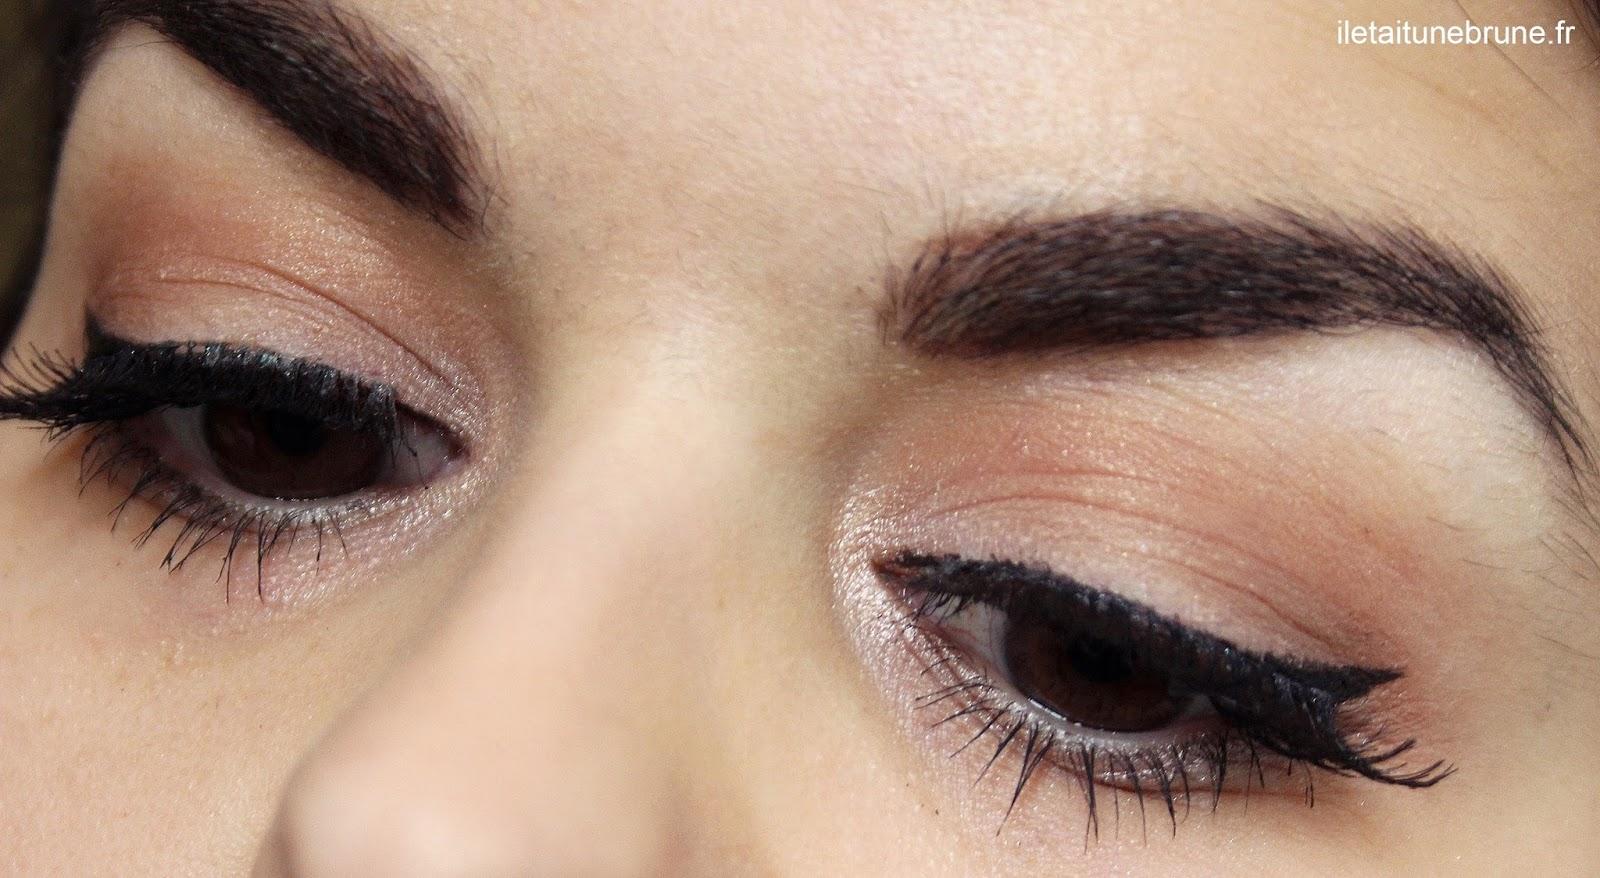 maquillage des yeux discret